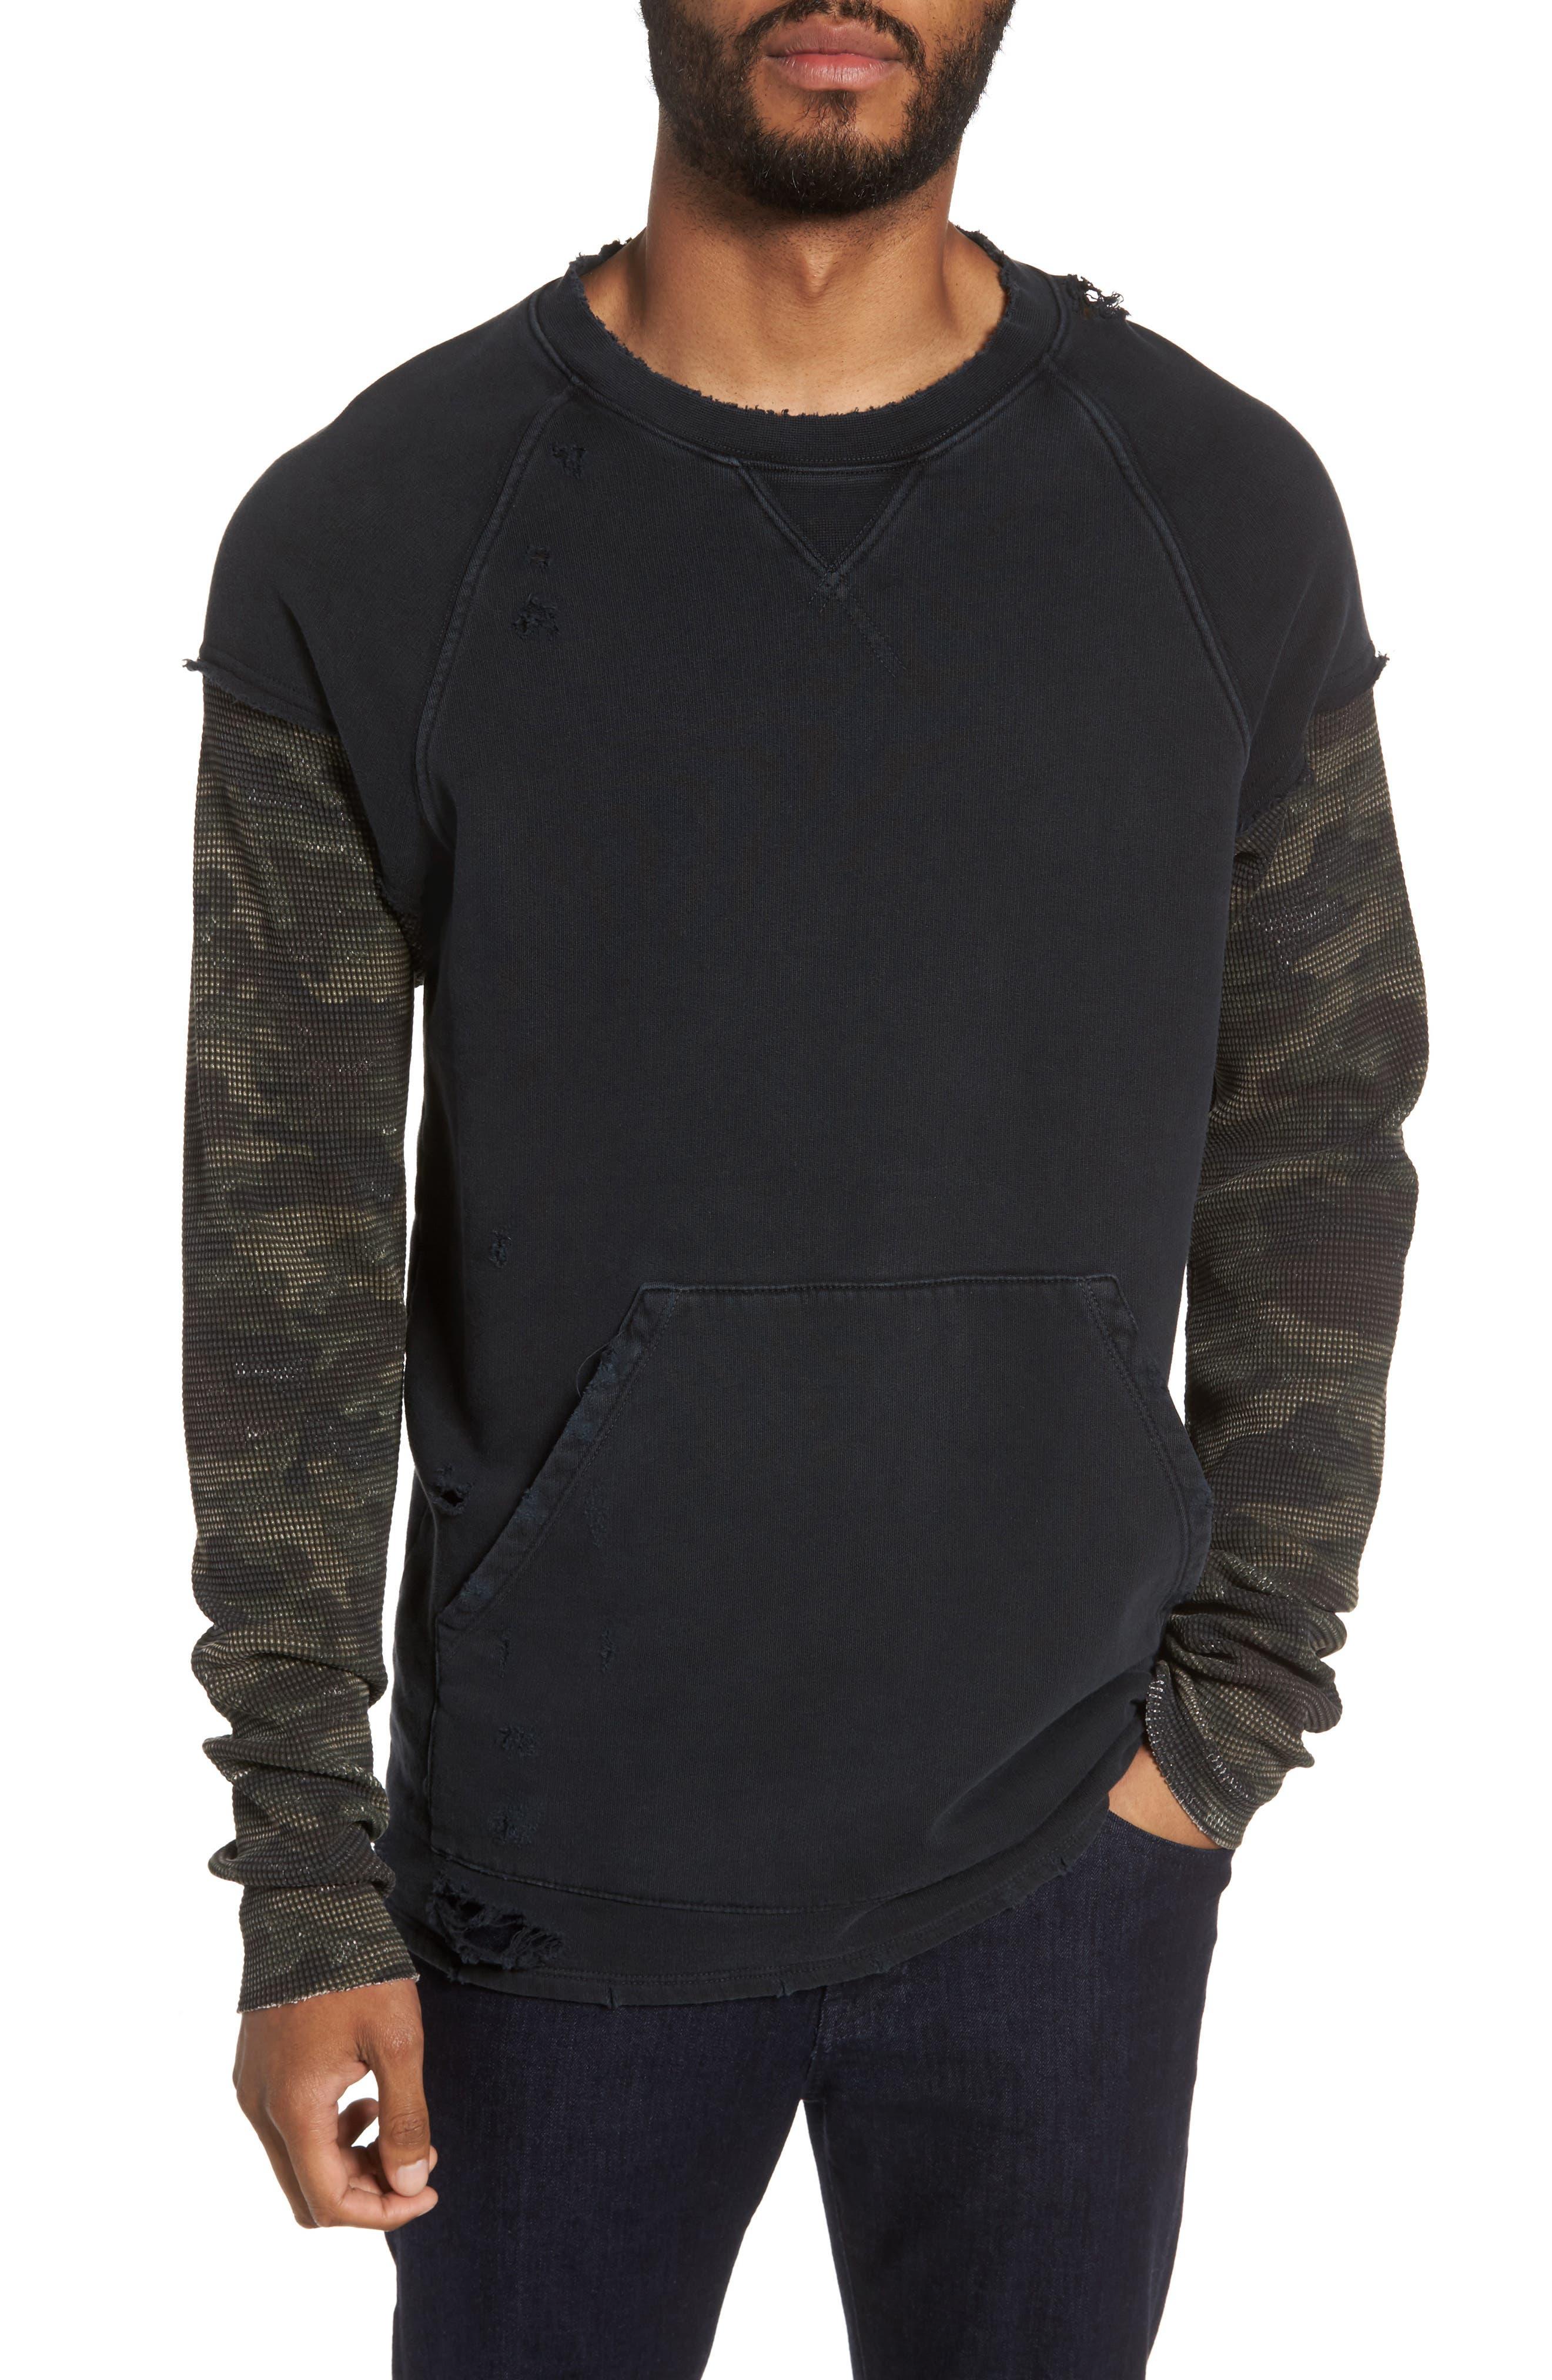 Main Image - Hudson Jeans Striker Slim Fit Crewneck Sweatshirt